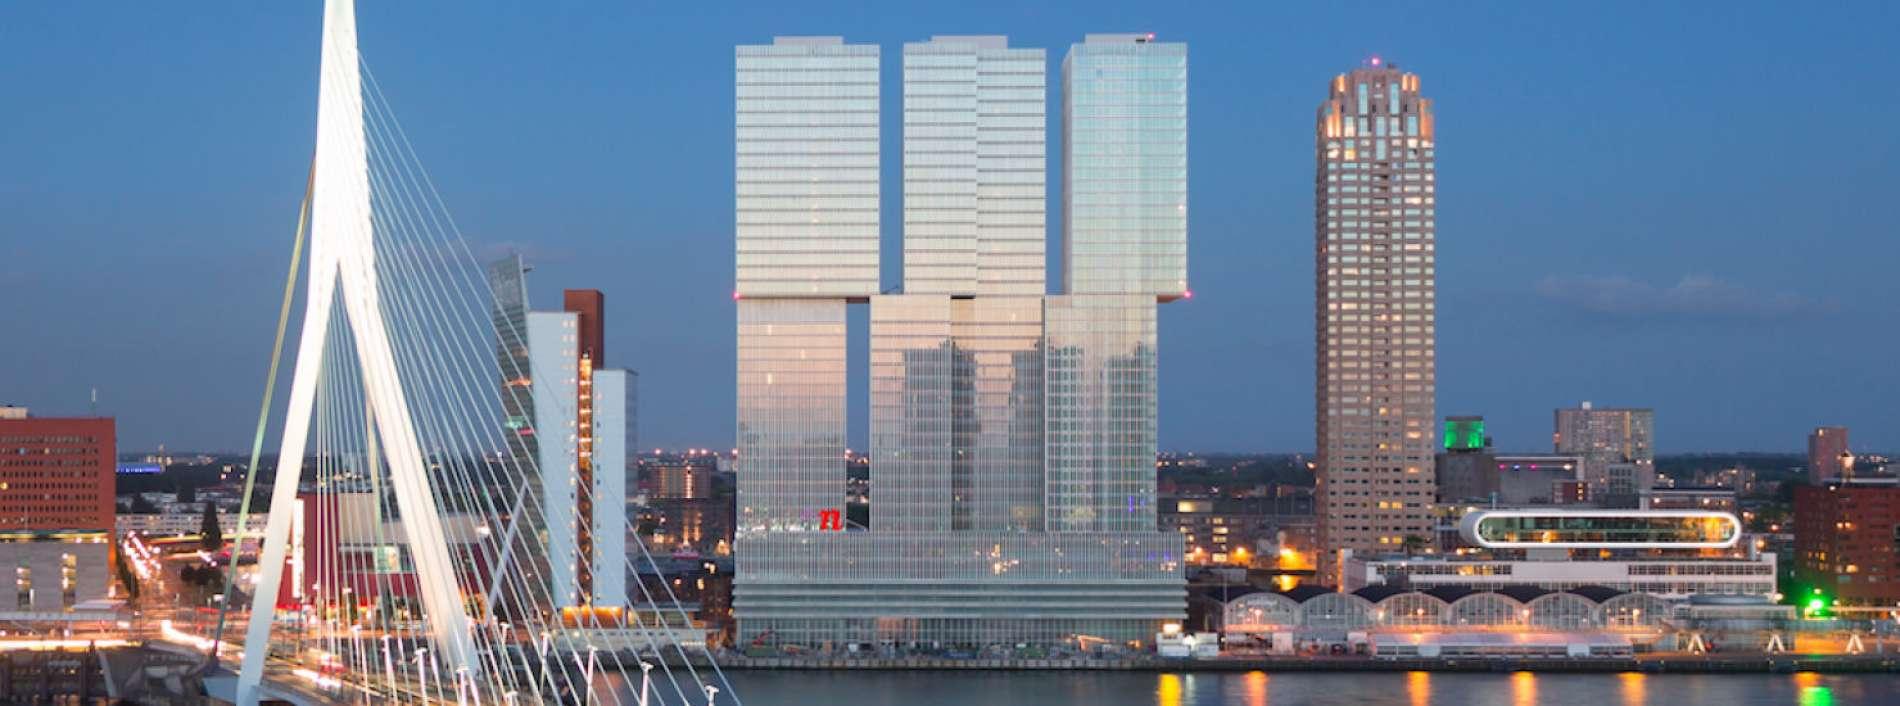 art-architecture-view-nhow-rotterdam.jpg